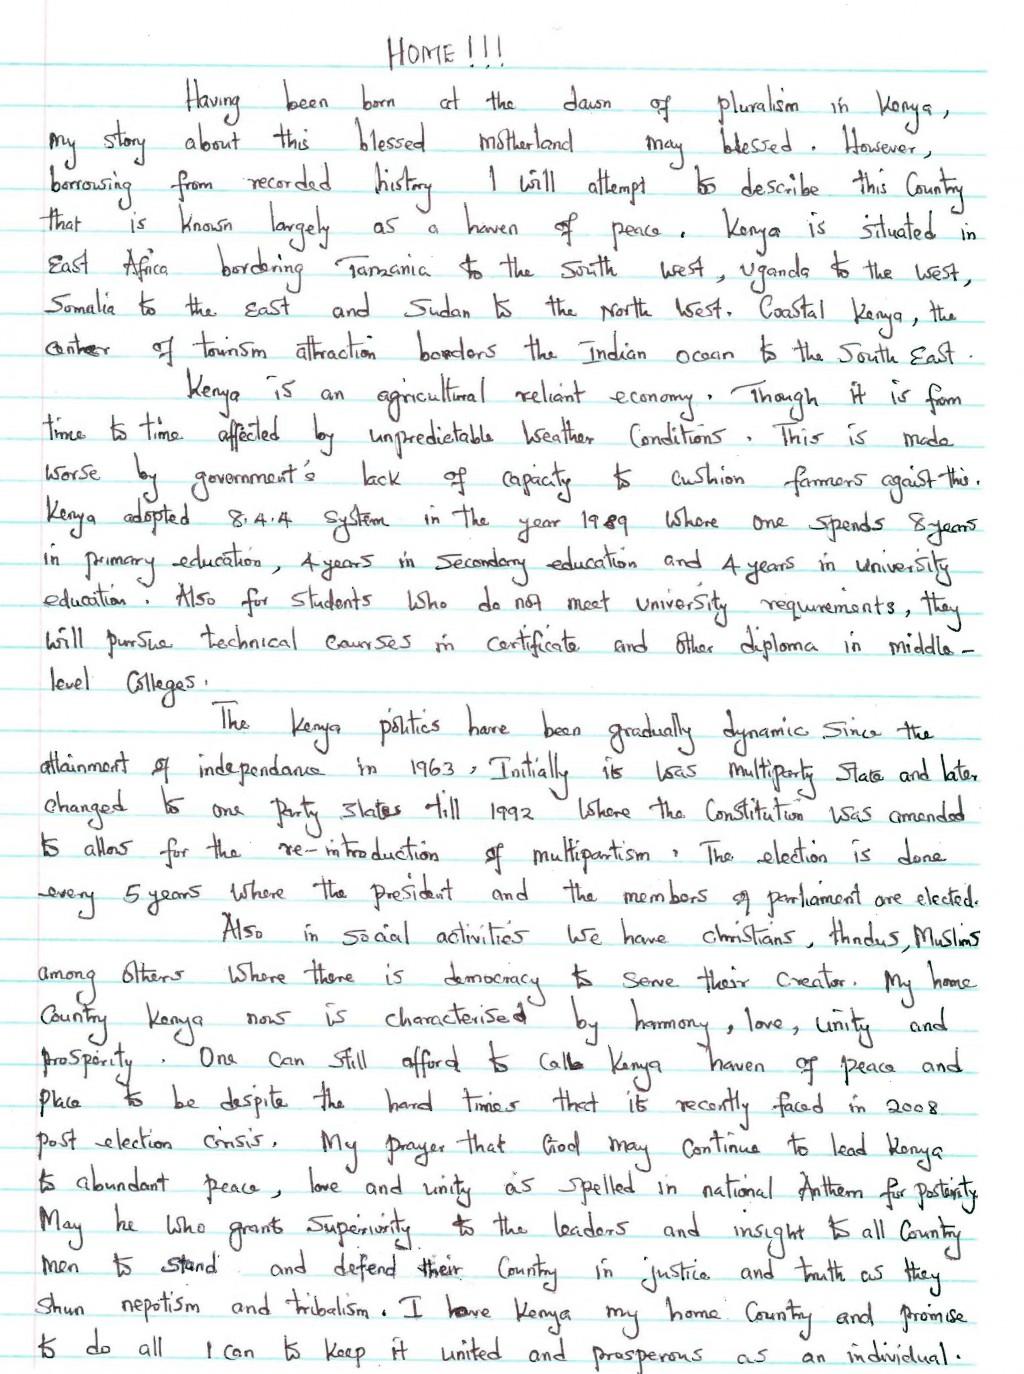 005 My Dream House Descriptive Essay Description Sweet Home Wr Writing Beautiful Describing Ideal Large